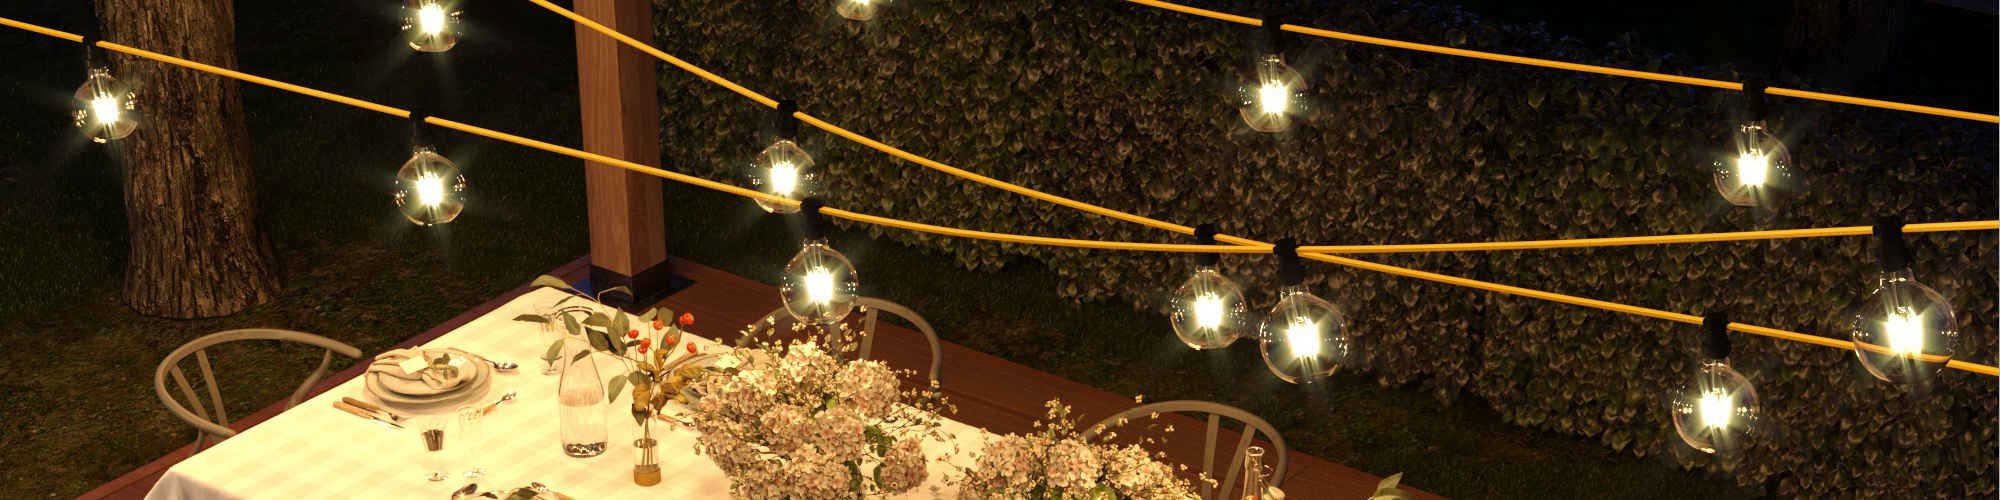 String lights System